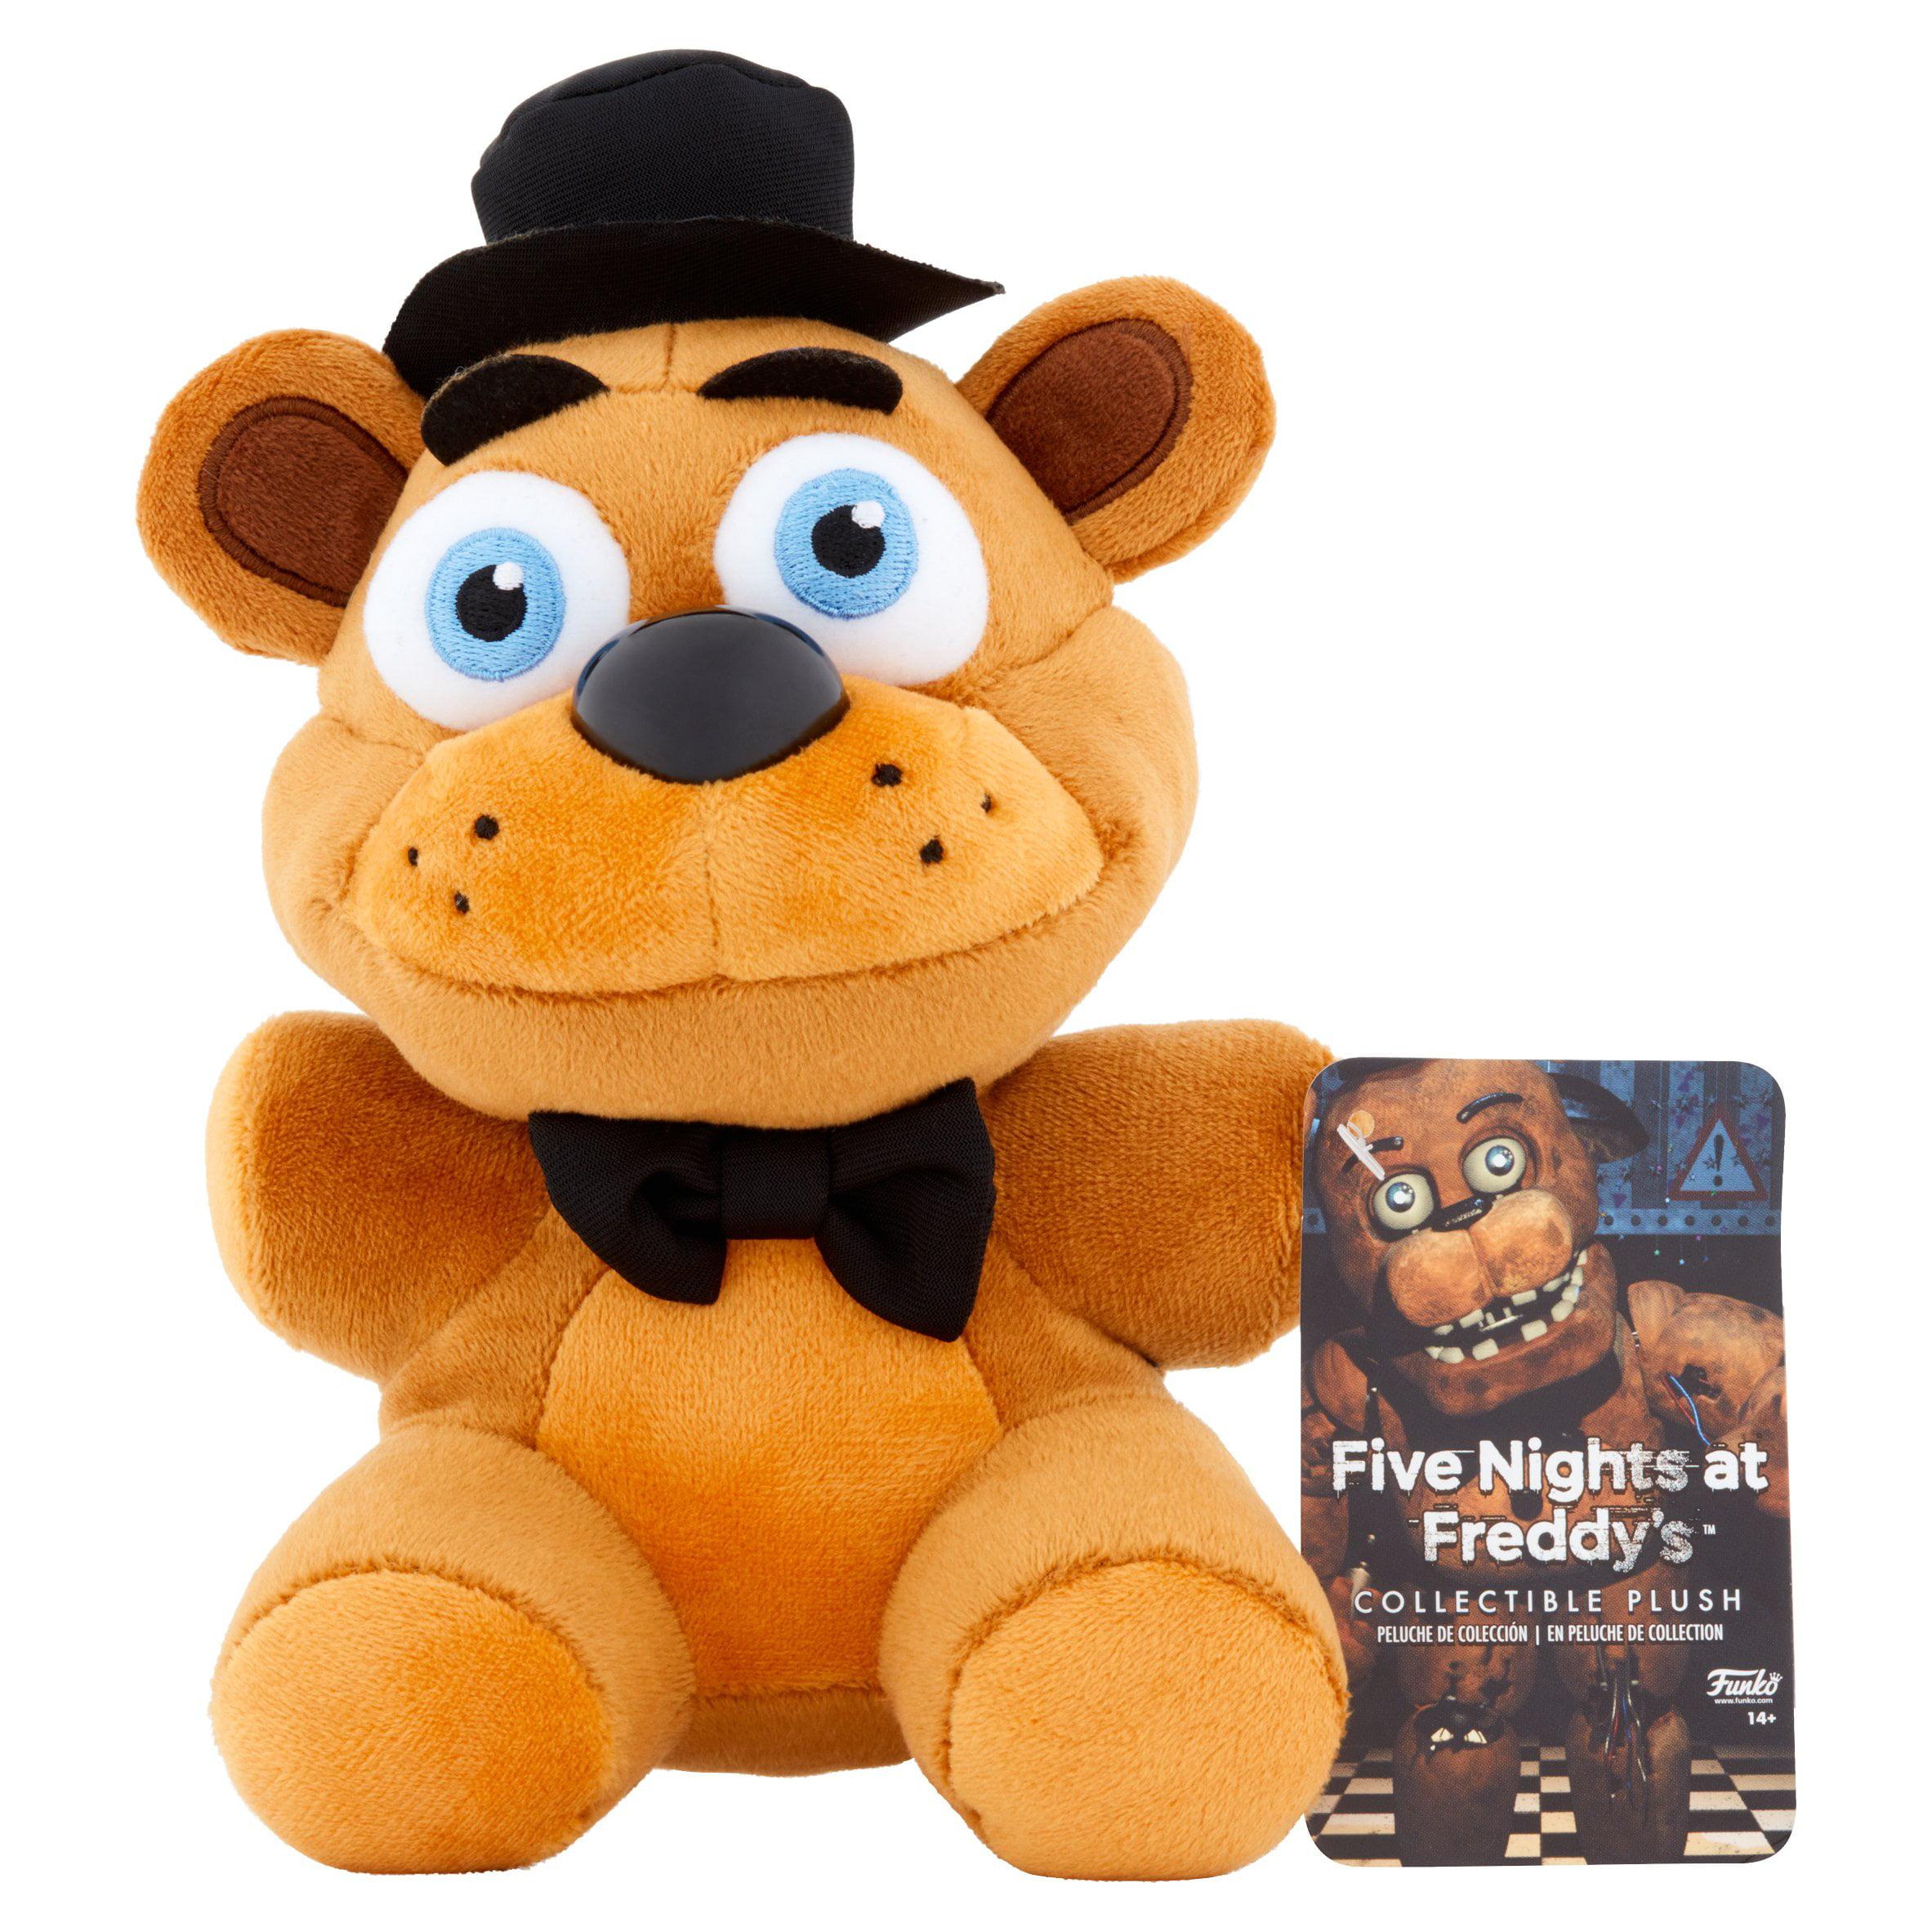 Halloween Funko Pop 2020 Five Nights At Freddy Funko: Five Nights at Freddy's   Freddy Collectible Plush